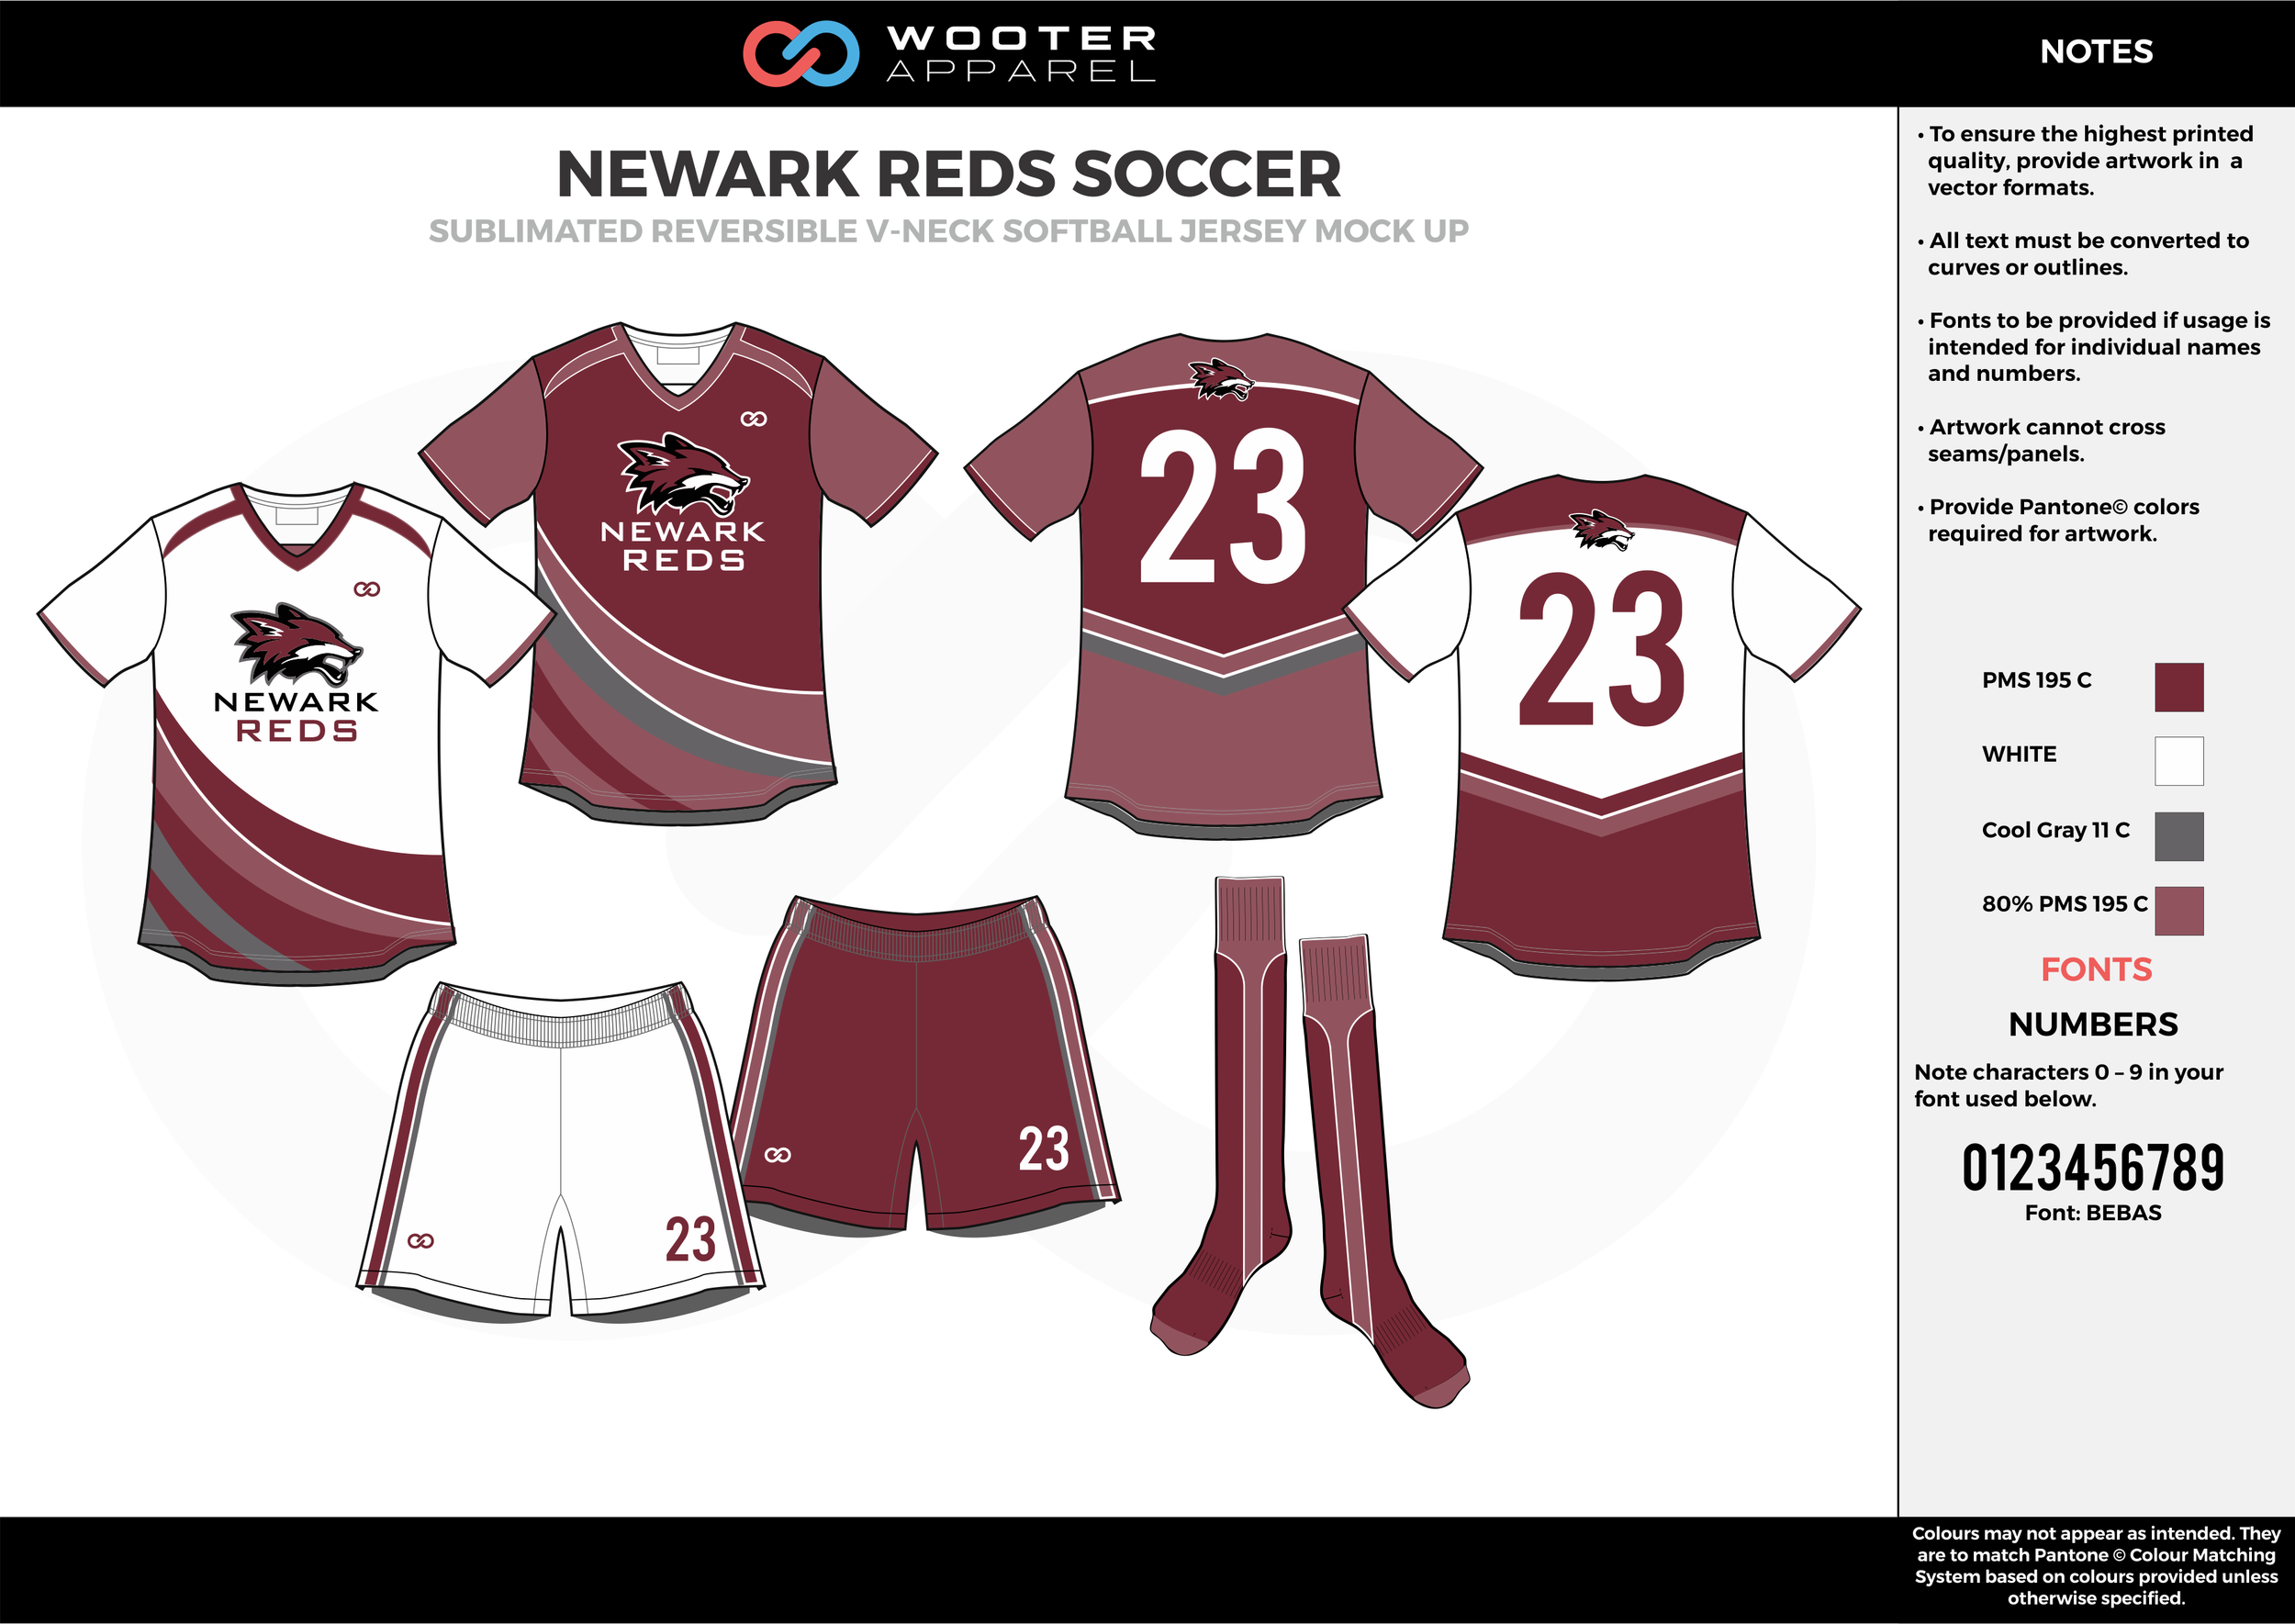 NEWARK REDS white wine red gray custom sublimated soccer uniform jersey shirt shorts socks